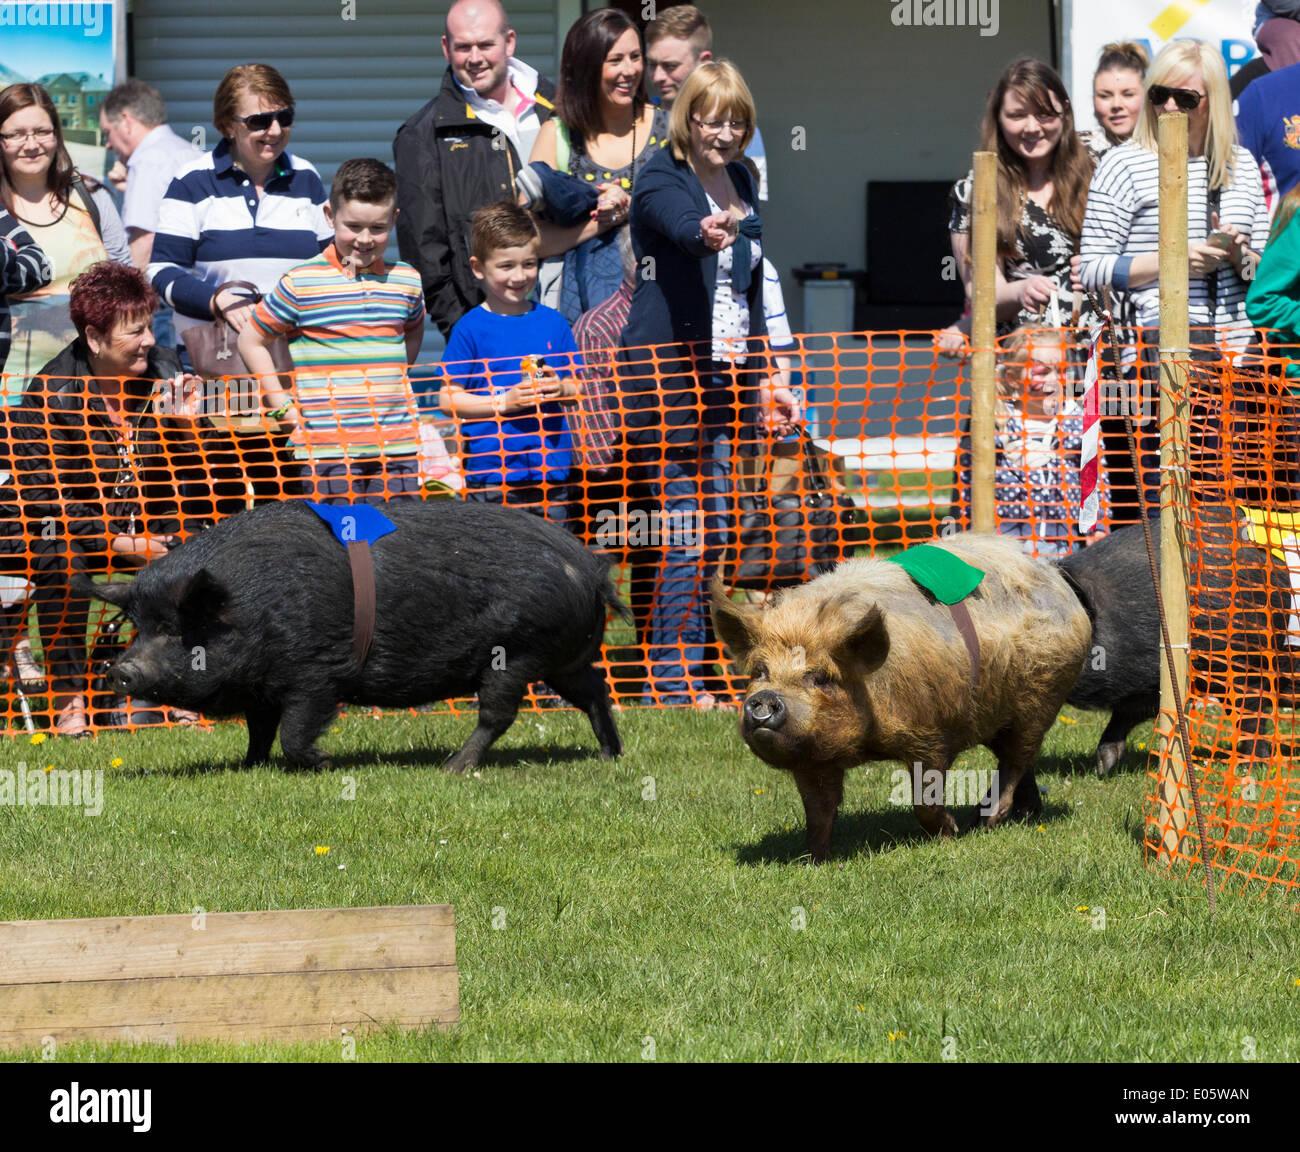 Pig racing at Bank Holiday Garden Fair.Preston Park, Stockton on Tees. UK Stock Photo